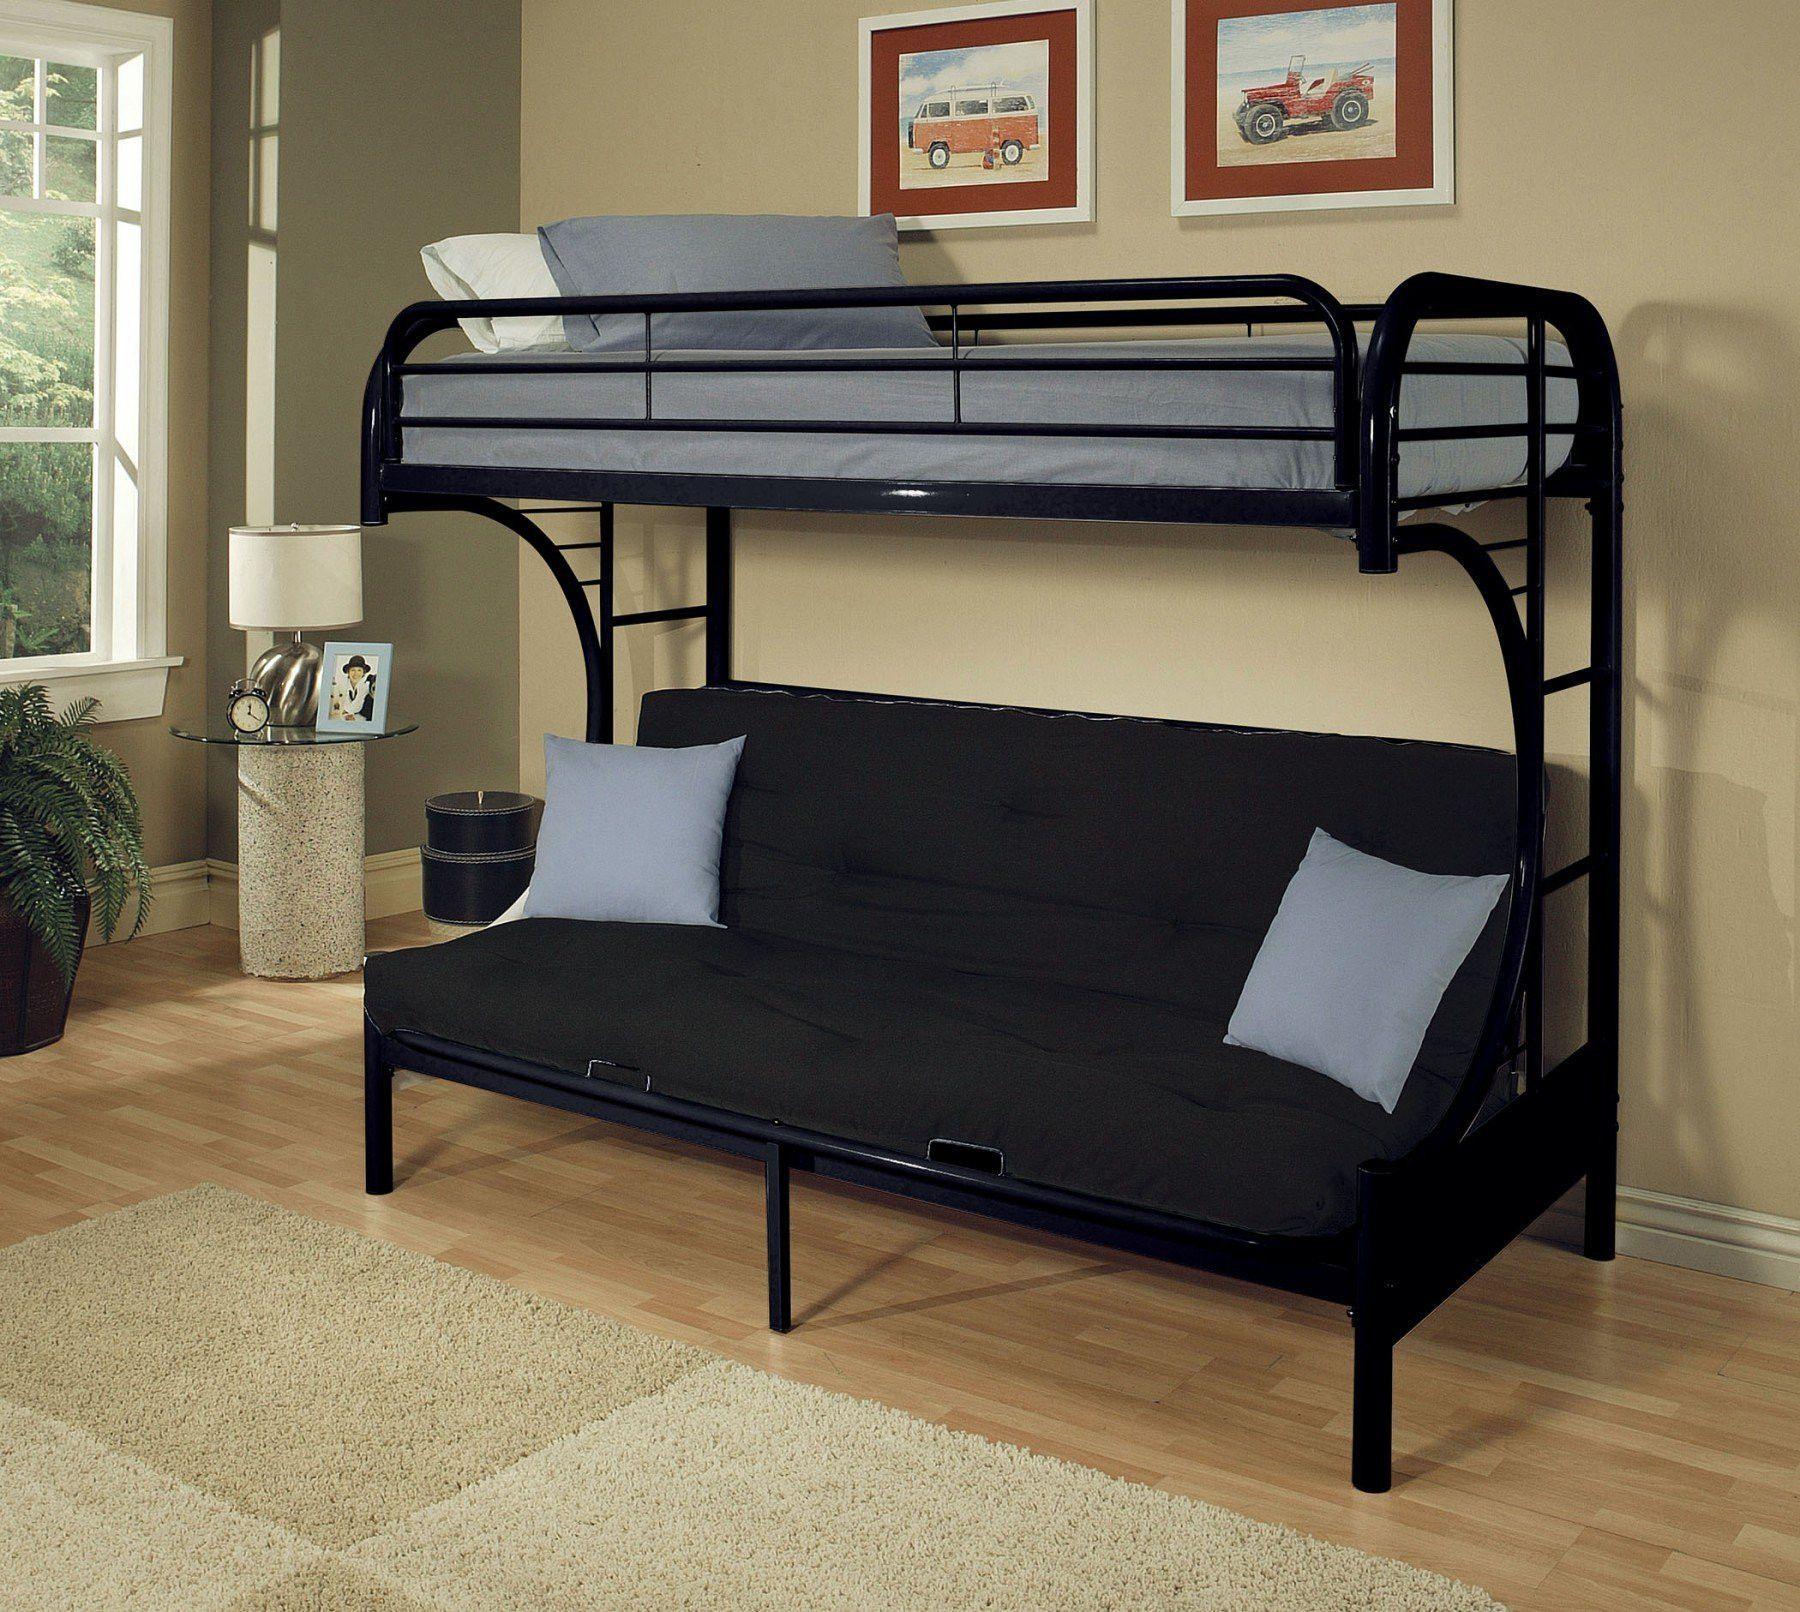 ACME Eclipse Twin XL/Queen/Futon Bunk Bed Black 02093BK